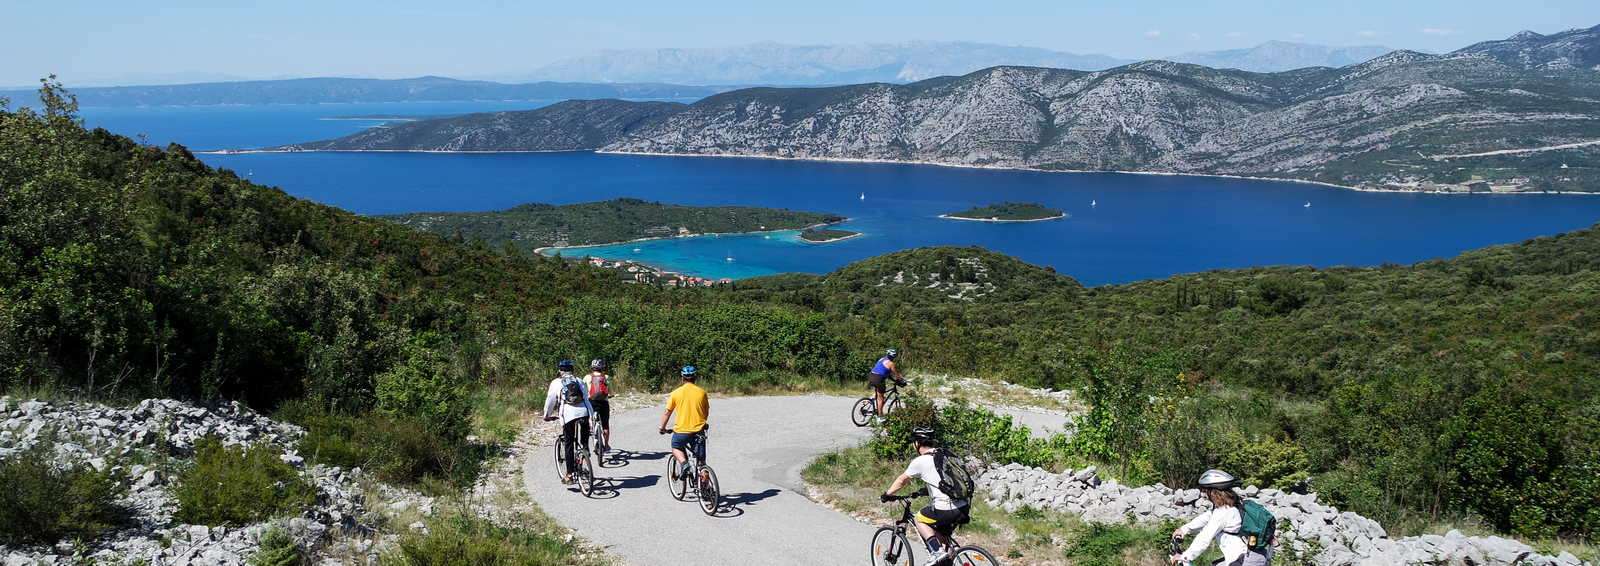 Cycling in Korcula, Croatia